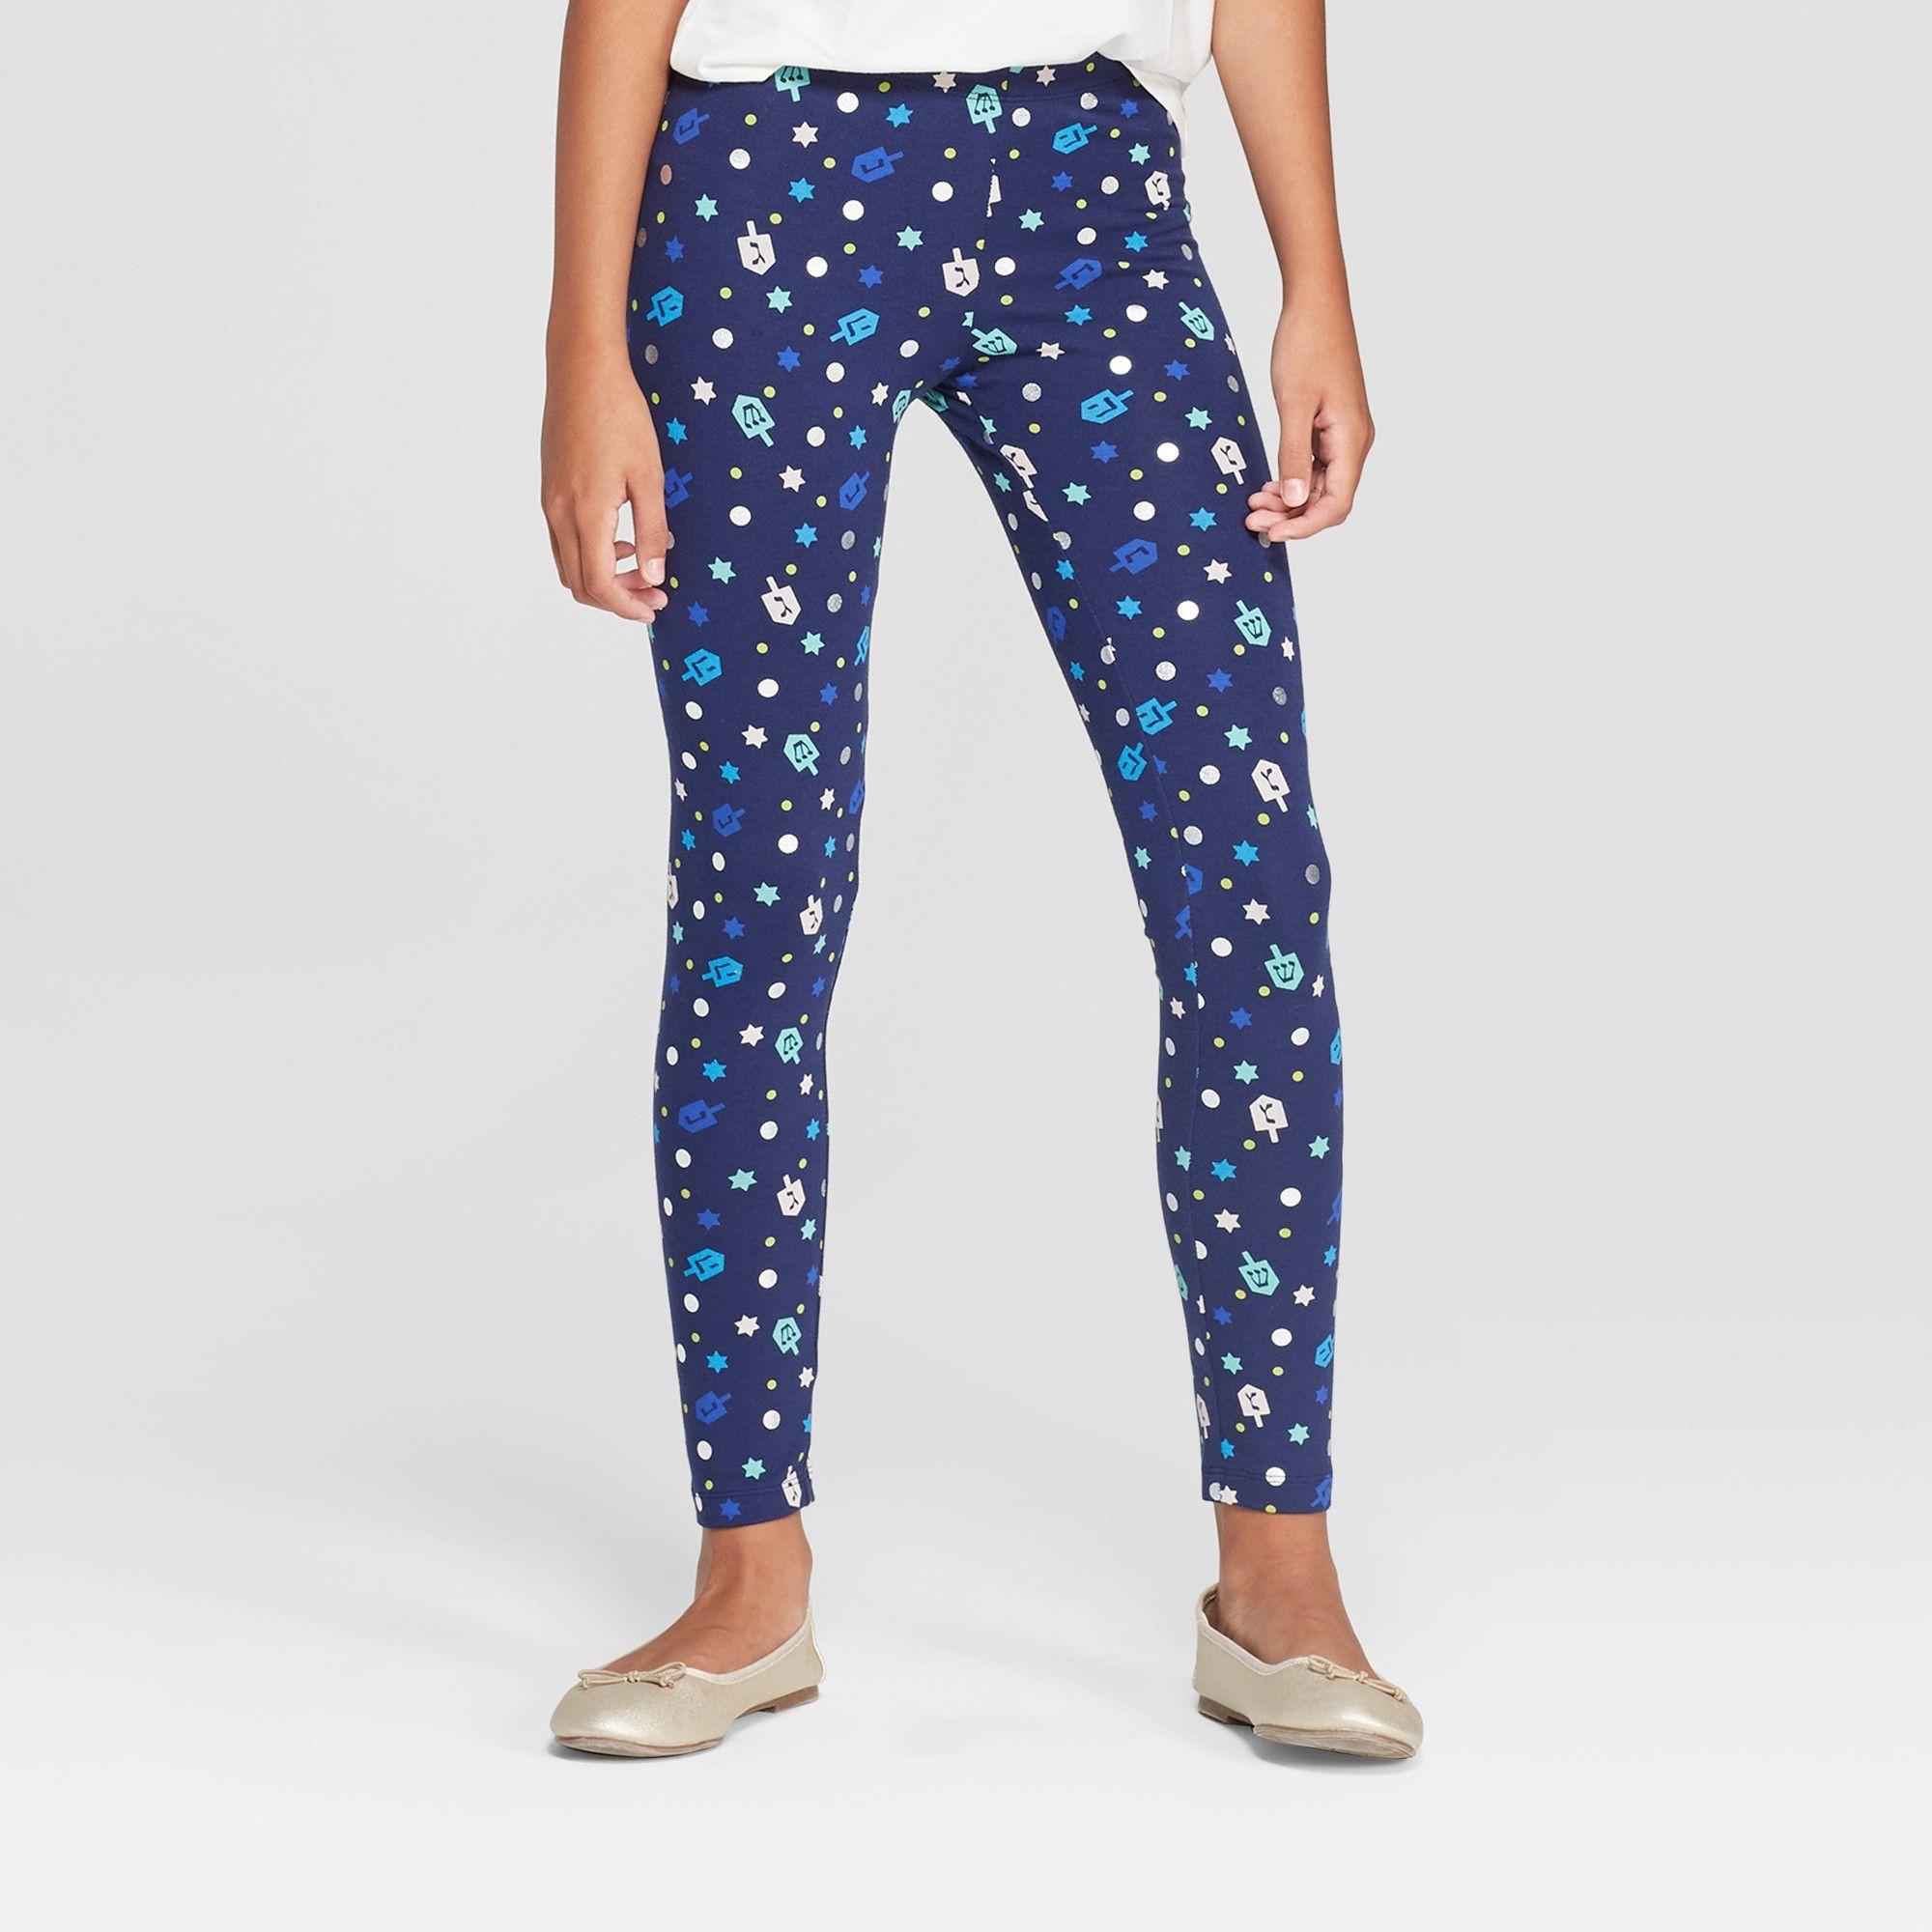 6c860a105 Girls' Hanukkah Leggings - Cat & Jack Navy XS, Blue | Products ...